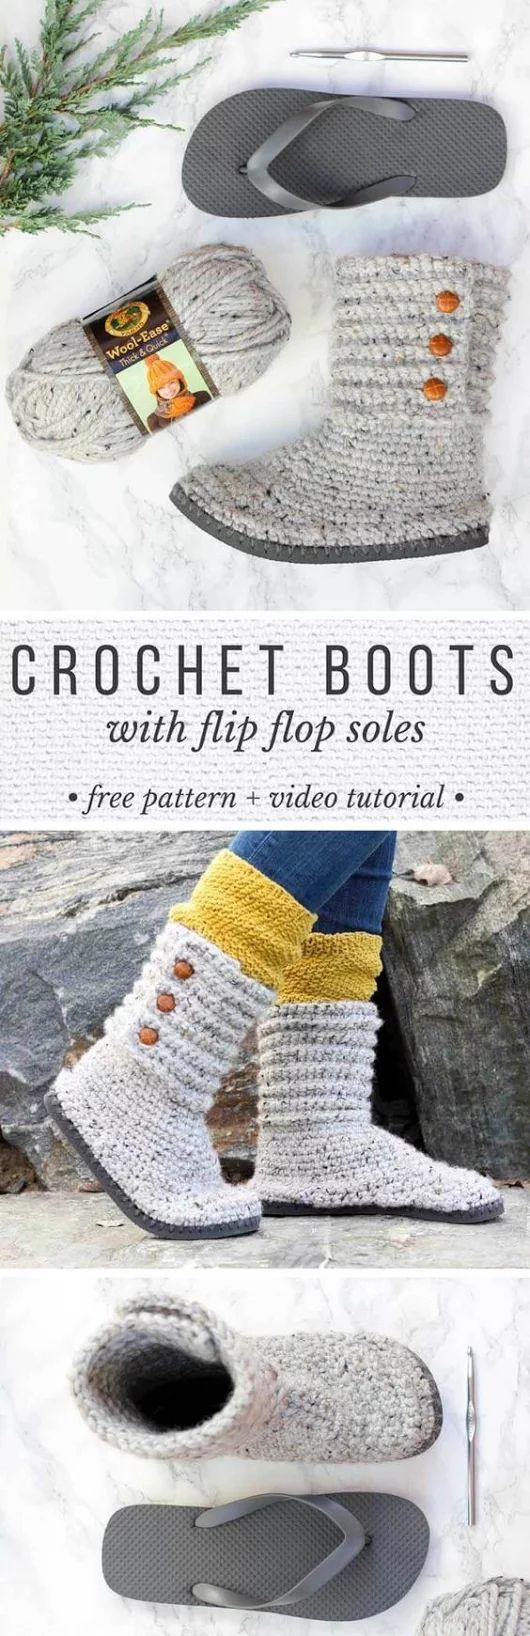 847 besten Crochet & Knitting Bilder auf Pinterest | Musterhäkeln ...